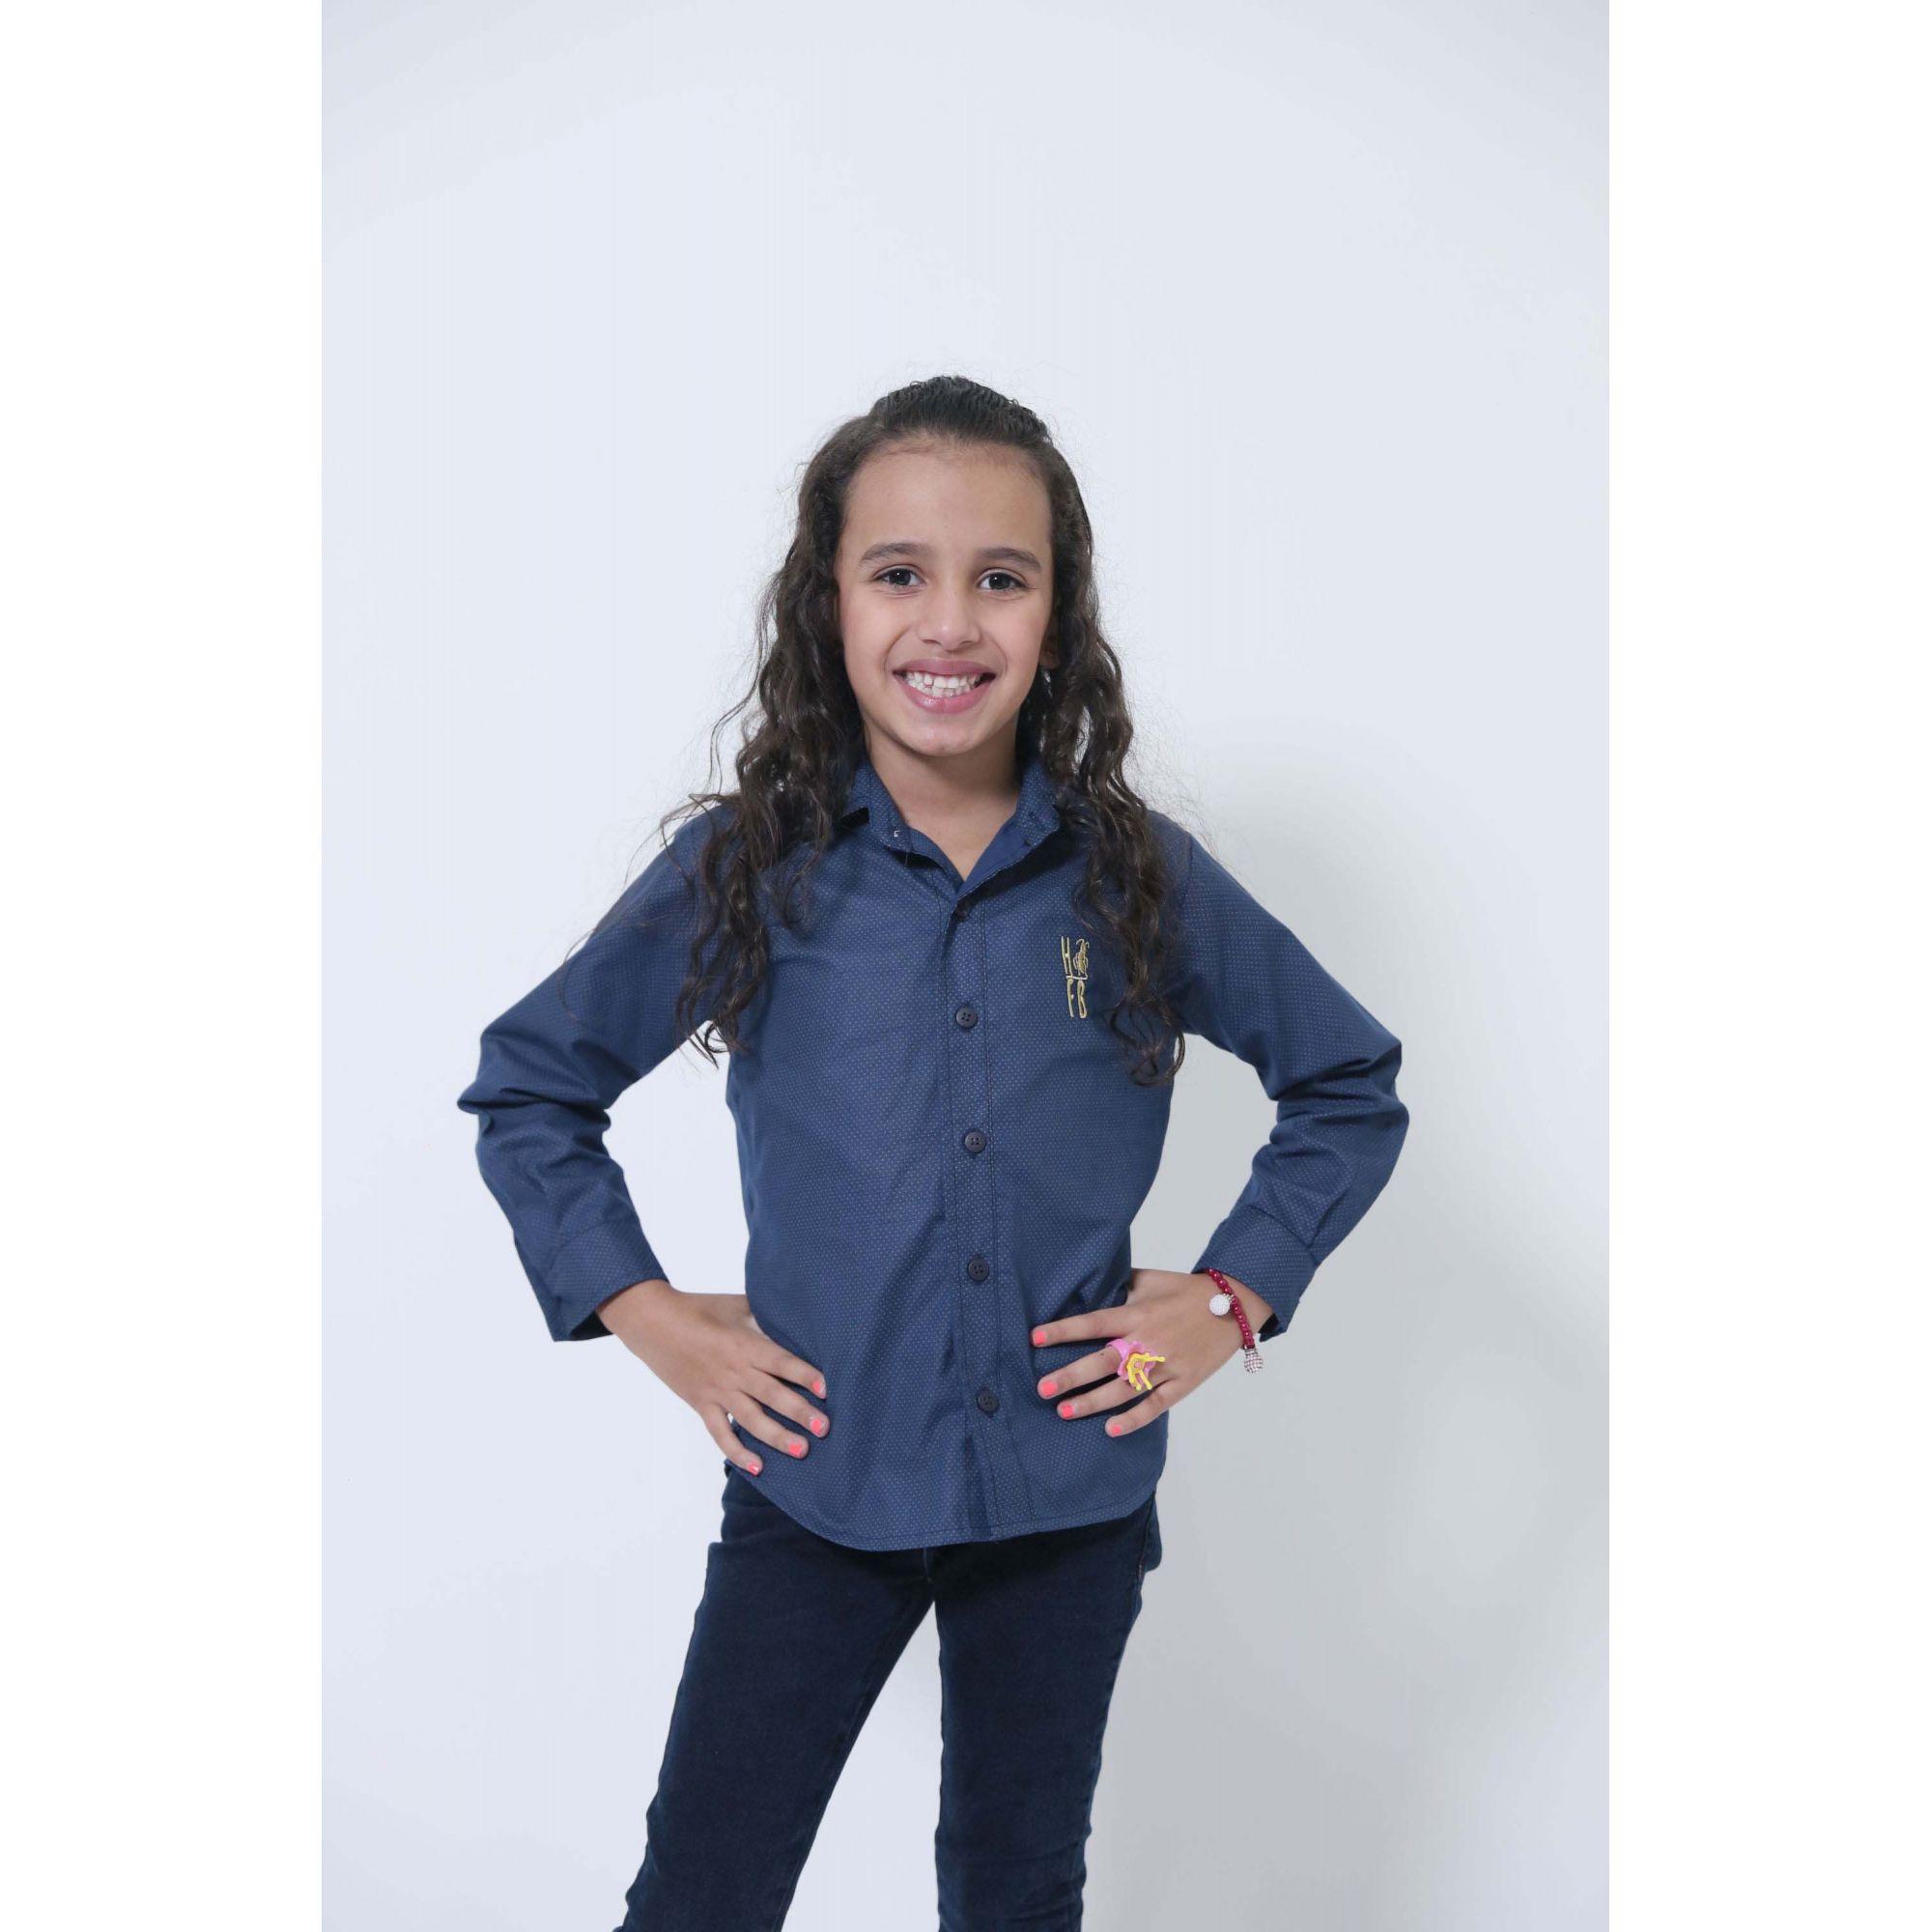 MÃE E FILHA > Kit 02 Camisas Social Azul Marinho Steve Seagal [Coleção Tal Mãe Tal Filha]  - Heitor Fashion Brazil